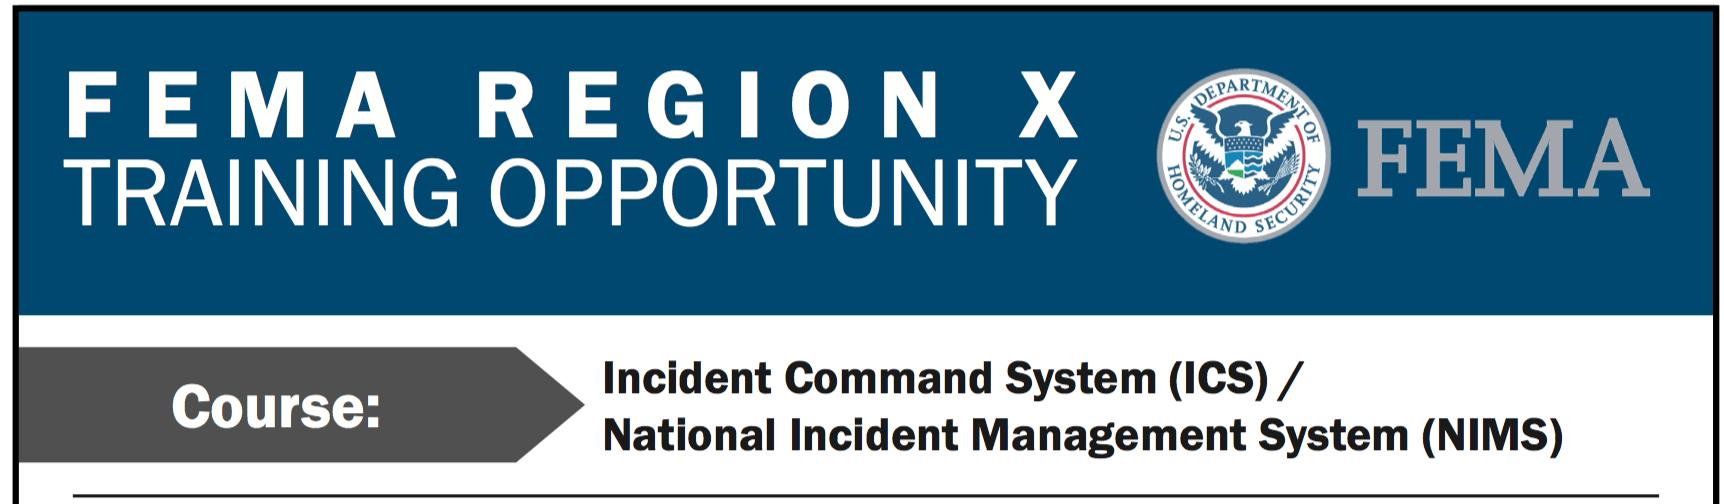 Fema Incident Command System Ics National Incident Mangement System Nims Training Kawerak